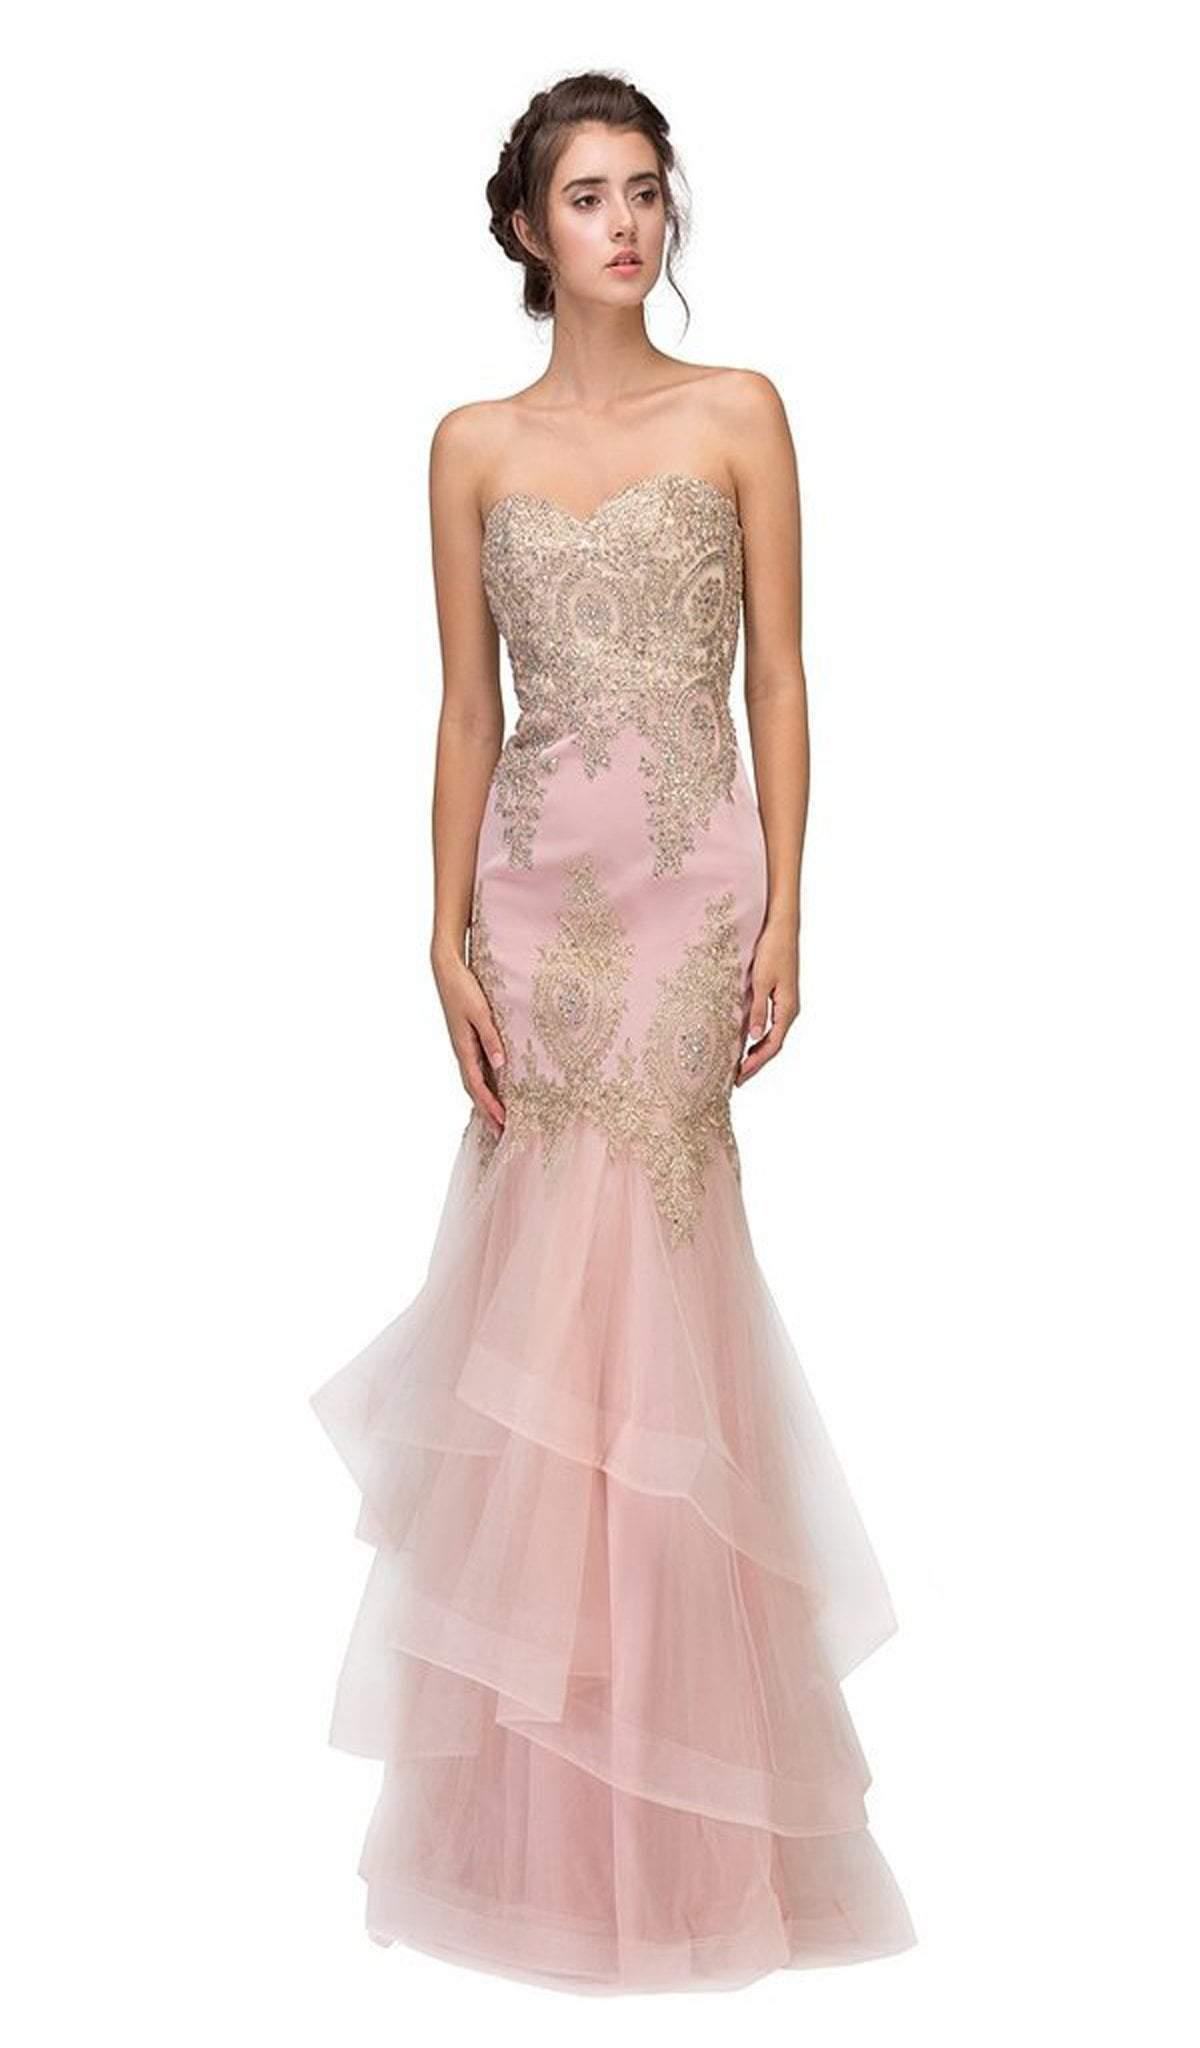 Eureka Fashion - Gilt Adorned Strapless Trumpet Evening Gown